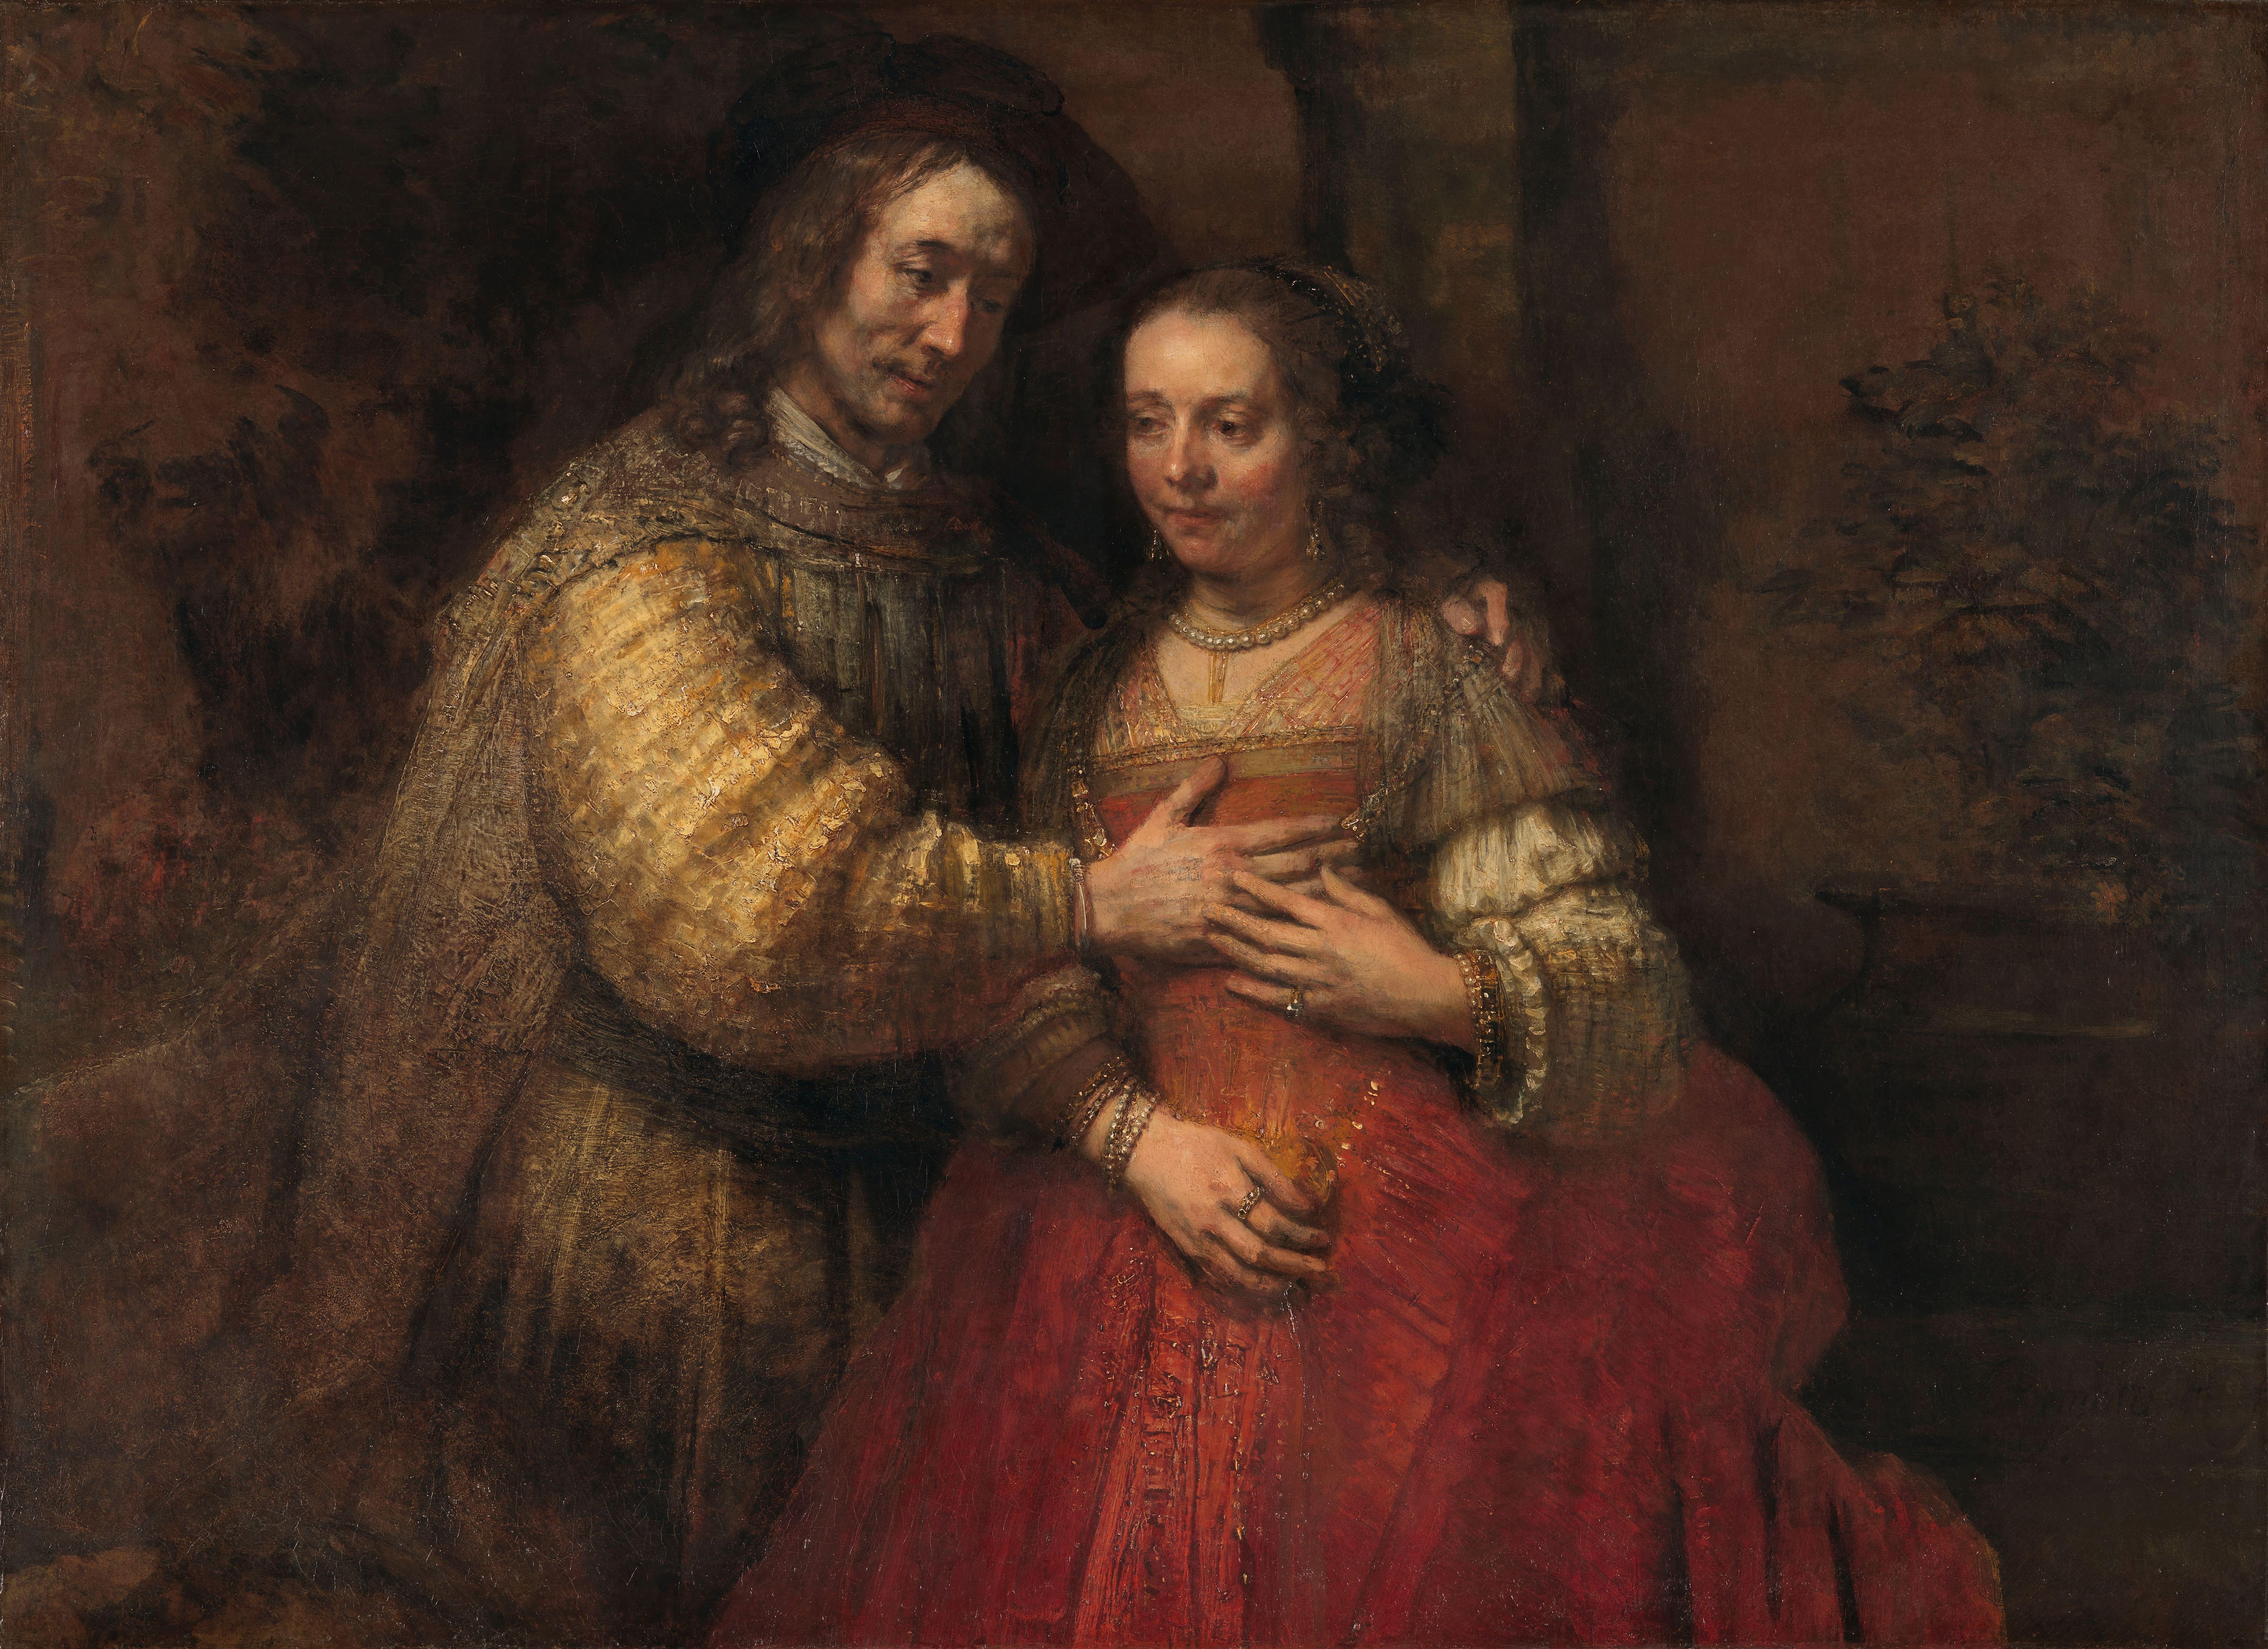 rembrandt van rijn Rembrandt harmenszoon van rijn, was born july 15, 1606 to a prosperous  family after attending the university of leiden, he convinced his.